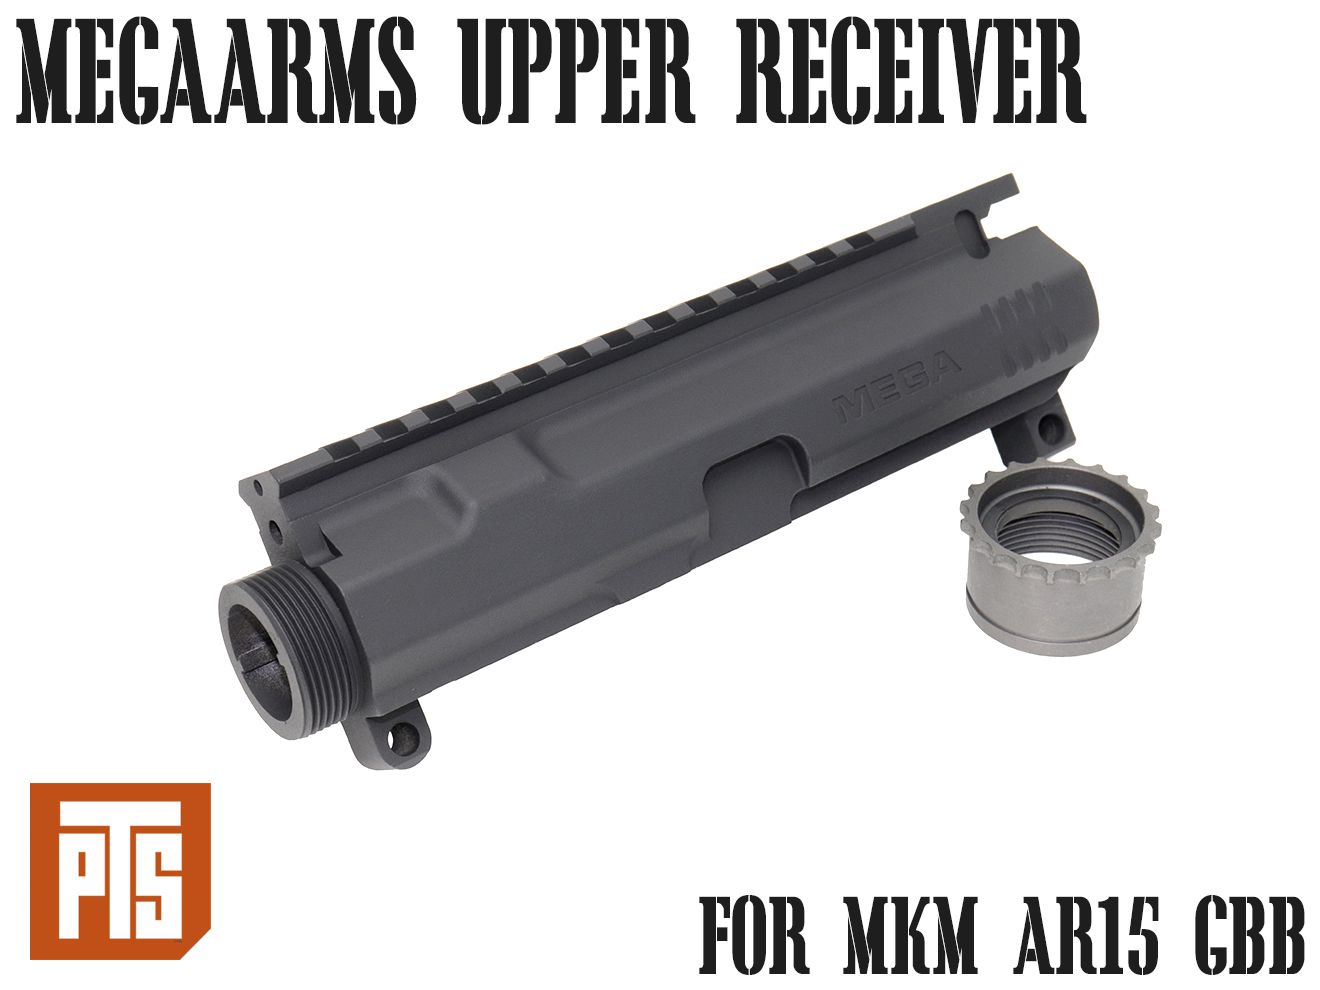 PTS MegaArms AR-15 ビレットアッパーレシーバー GBB◆PTS MEGAARMS MKM に他社製RASを取り付け可能 KSC/KWAシステム対応 強化カスタム